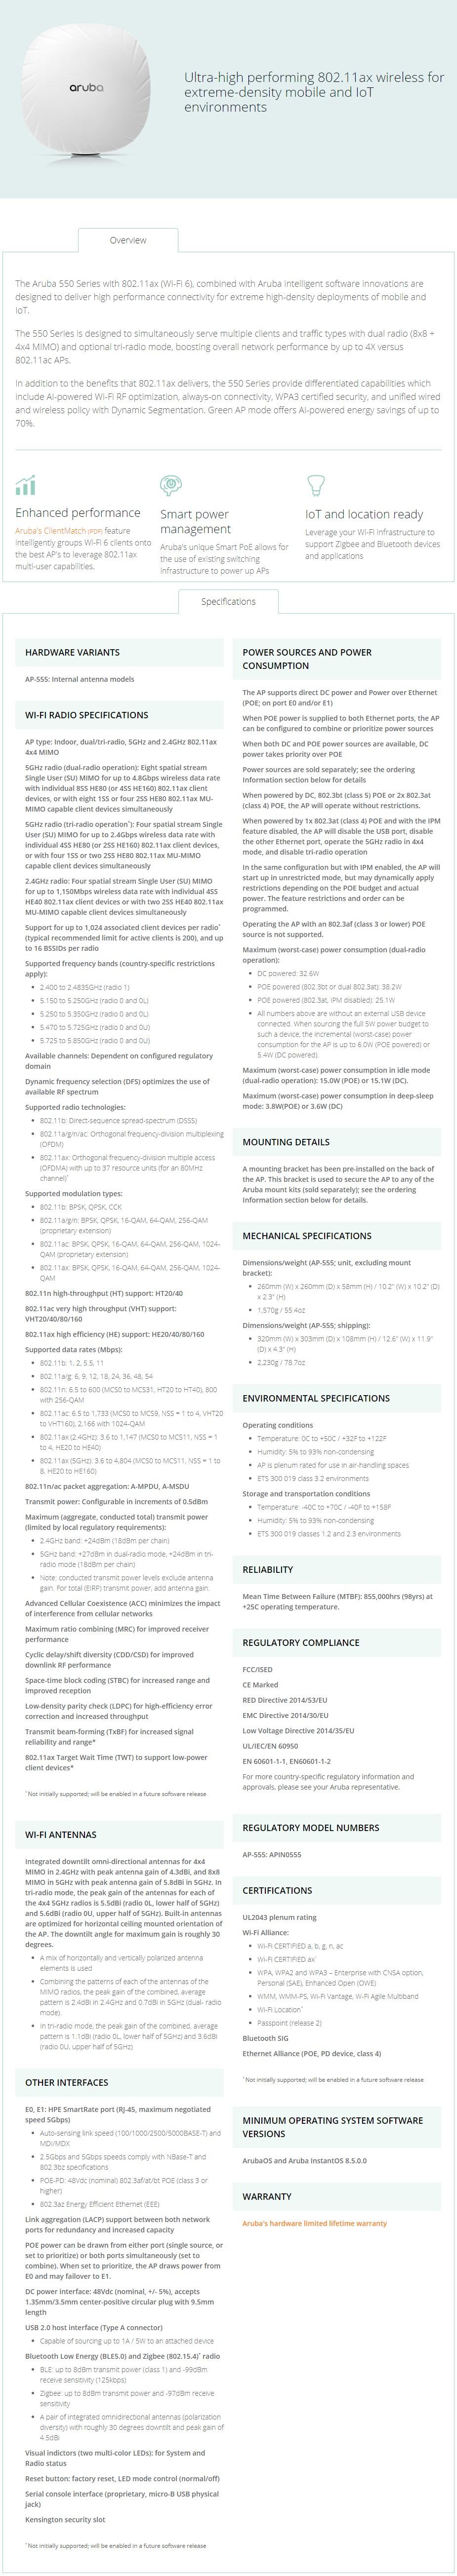 HPE Aruba AP-555 802.11ax Tri-Radio 8x8 MU-MIMO Indoor Access Point - Overview 1